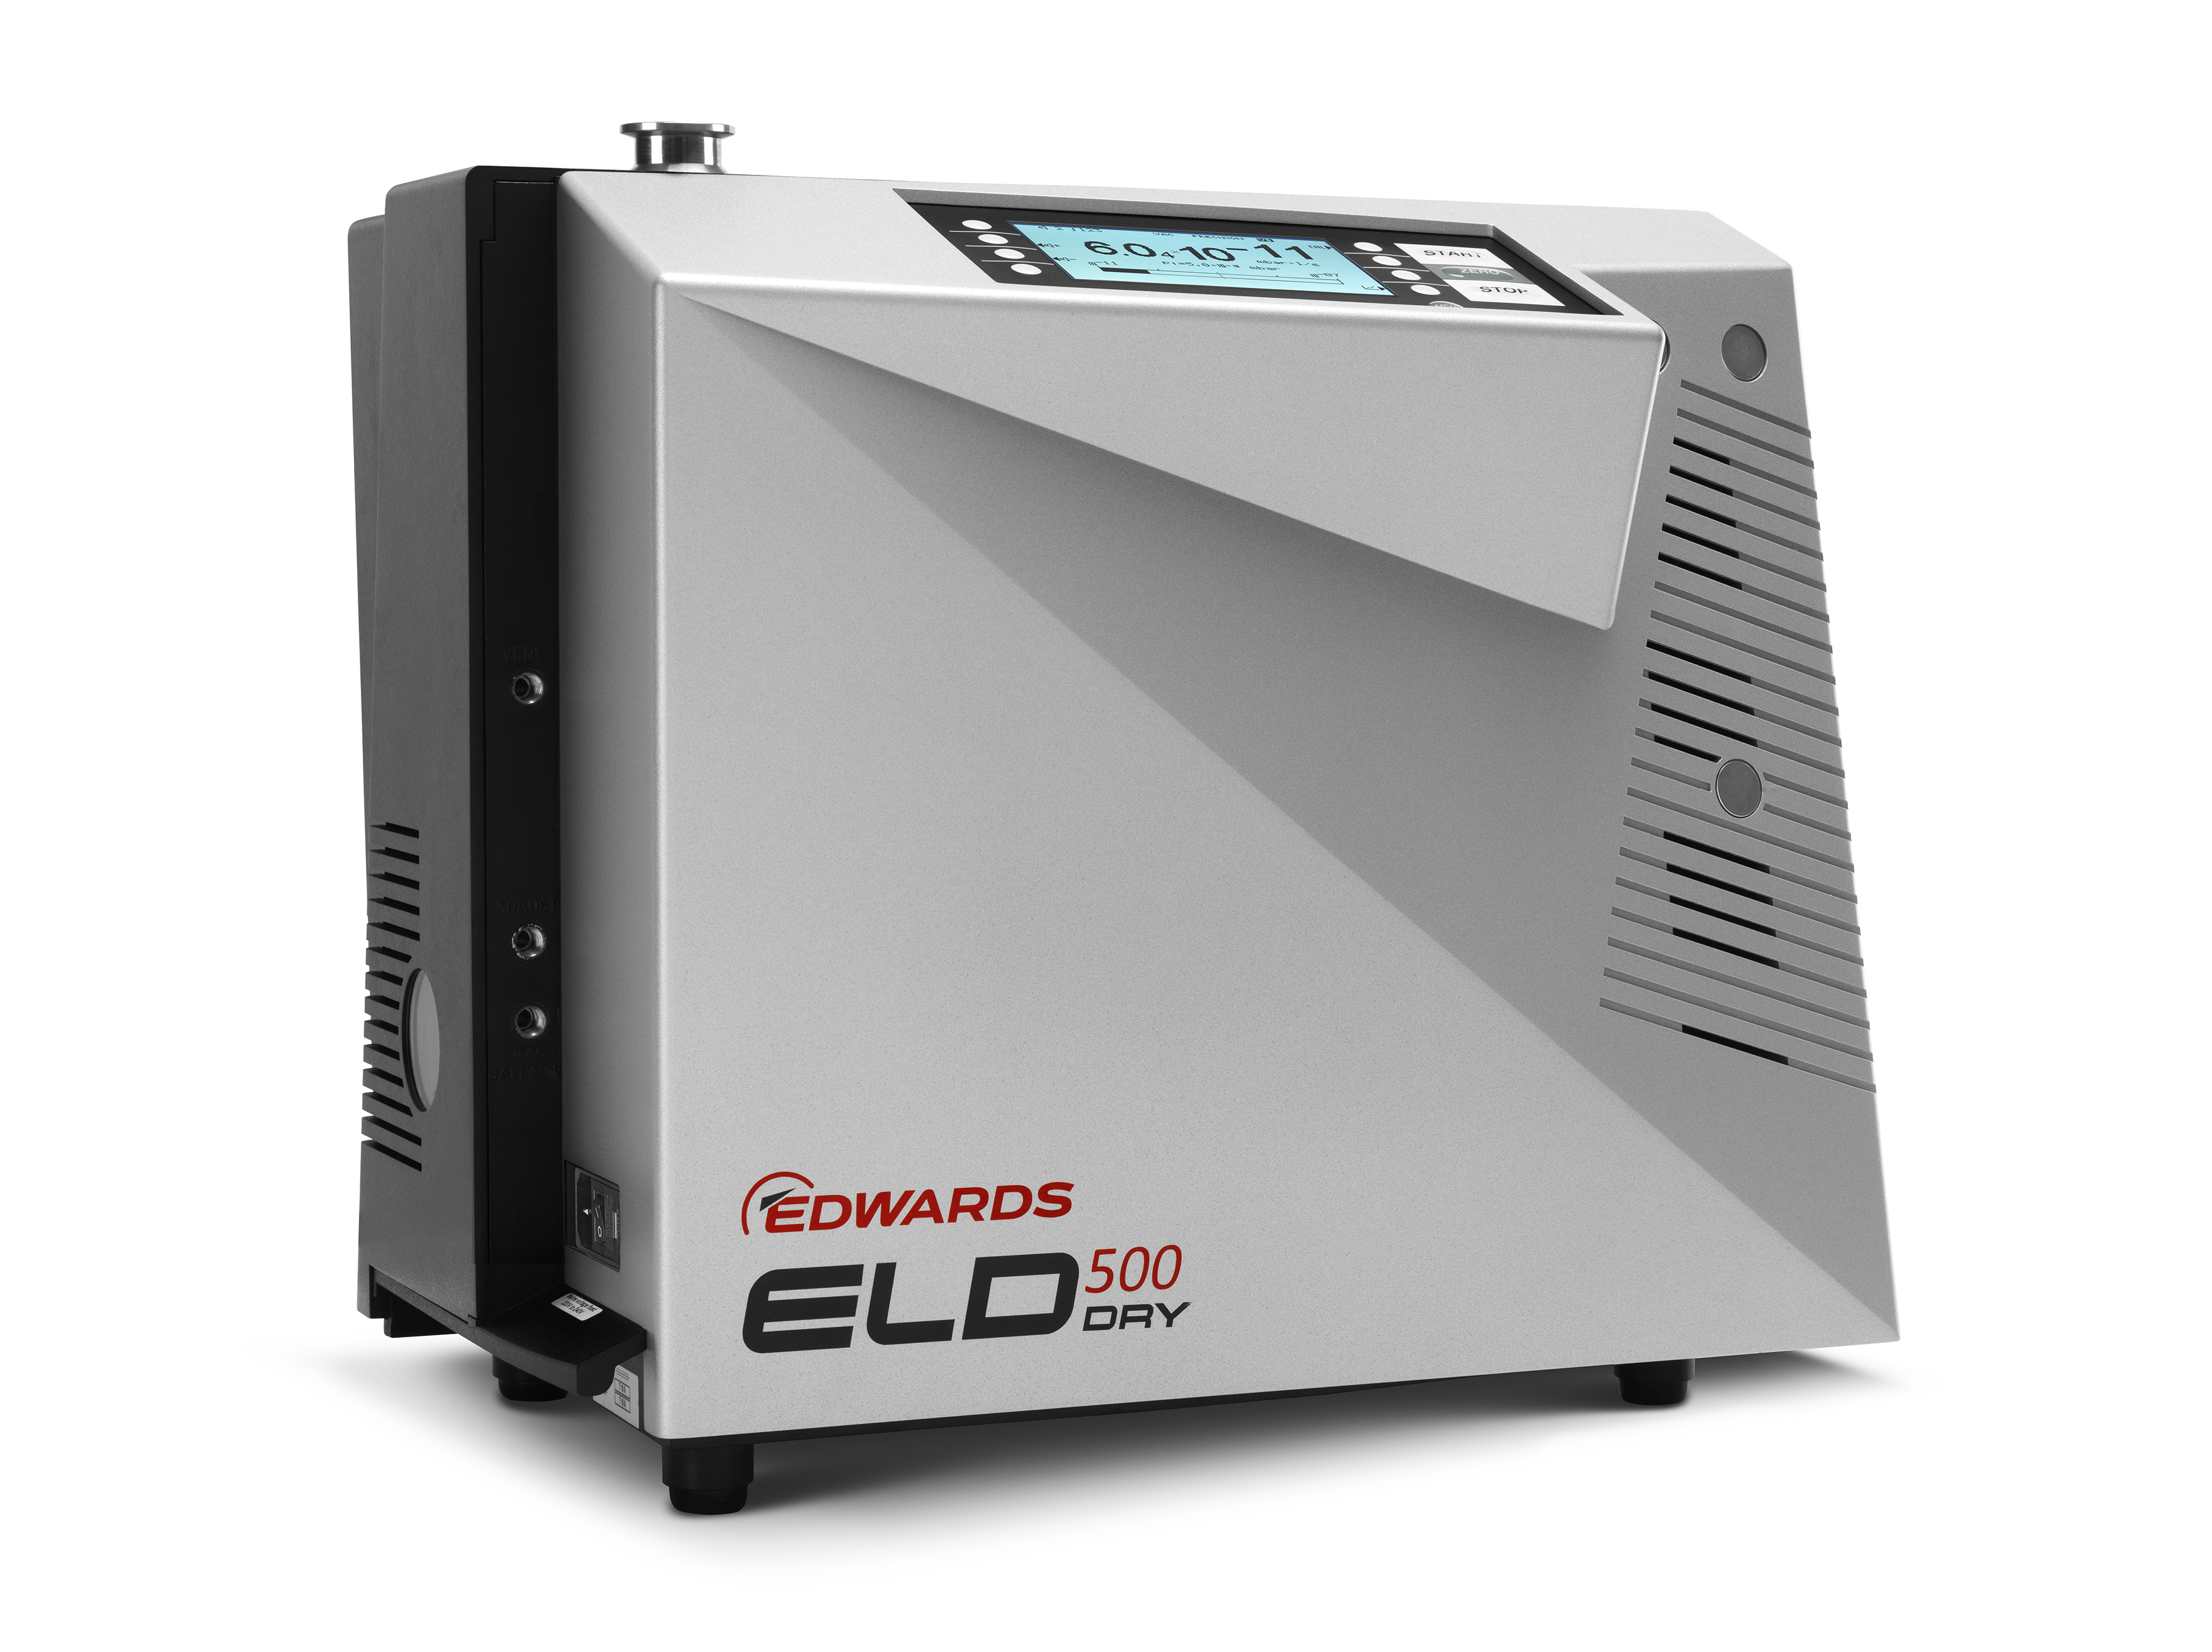 Edwards ELD500檢漏儀(照片:美國商業資訊)